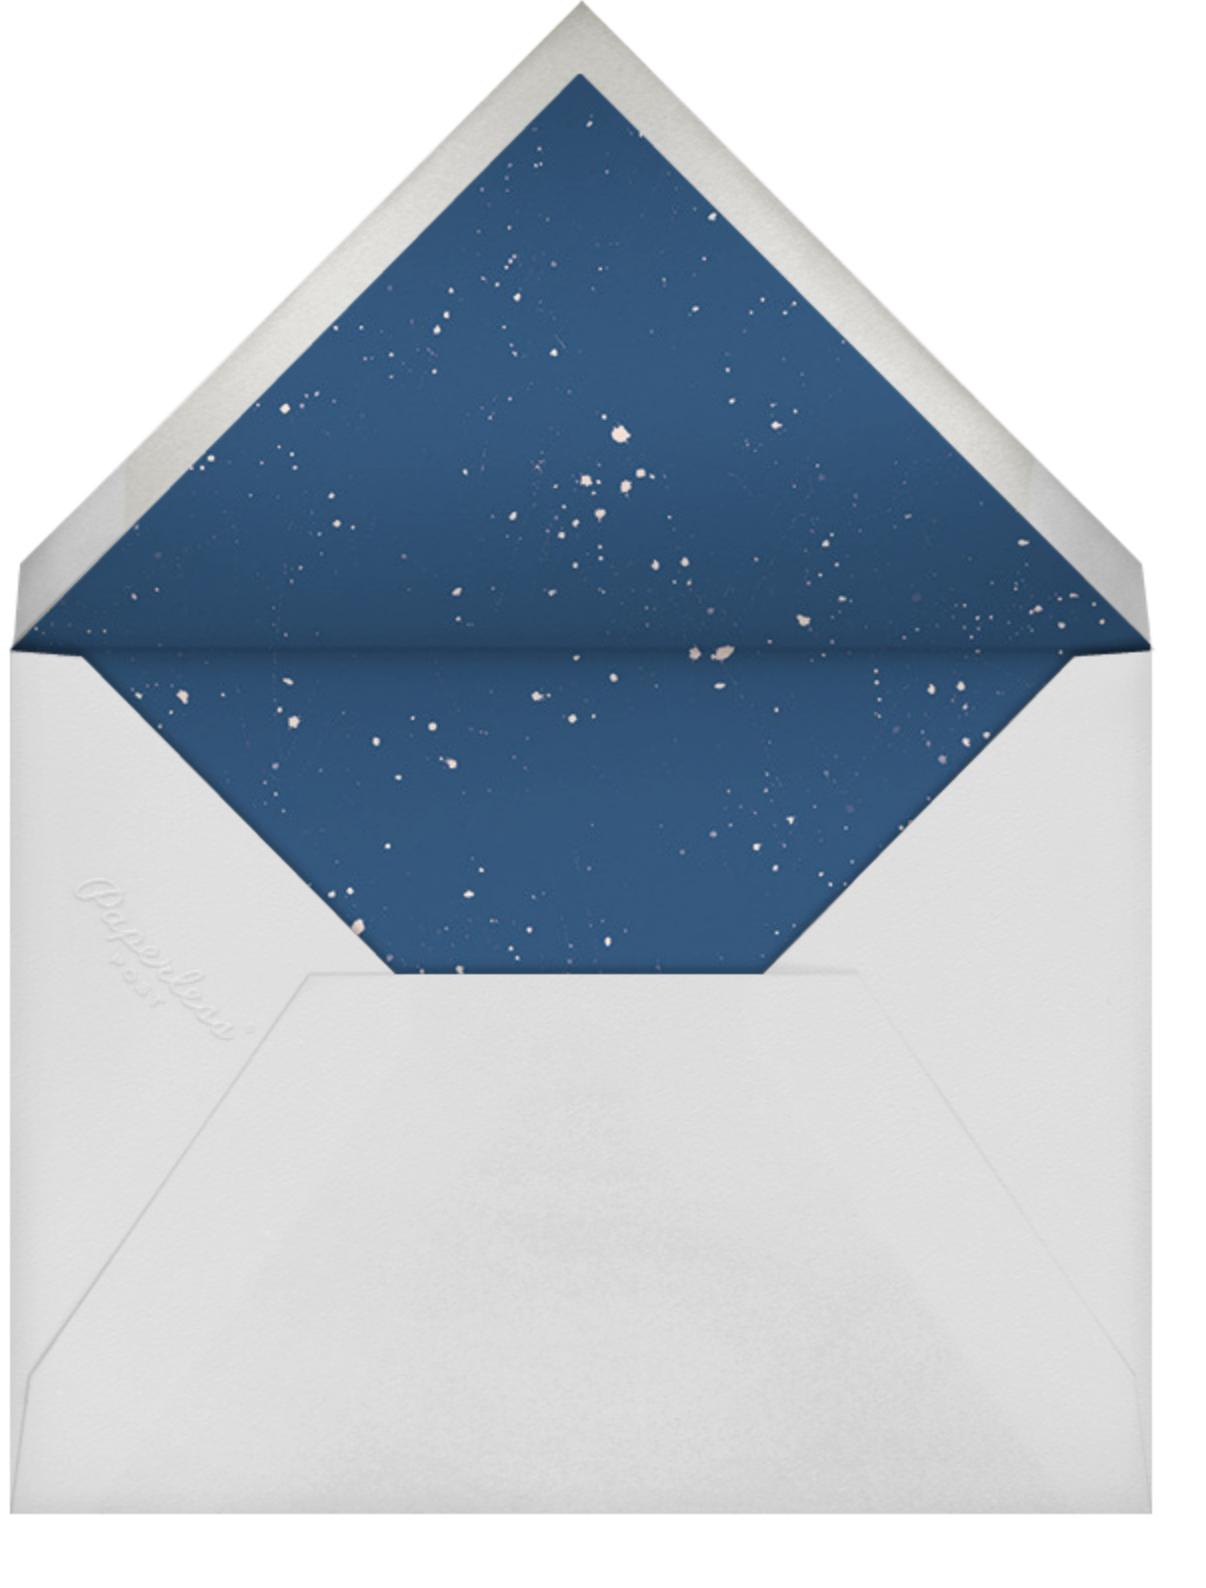 Susanna - Paperless Post - Professional events - envelope back